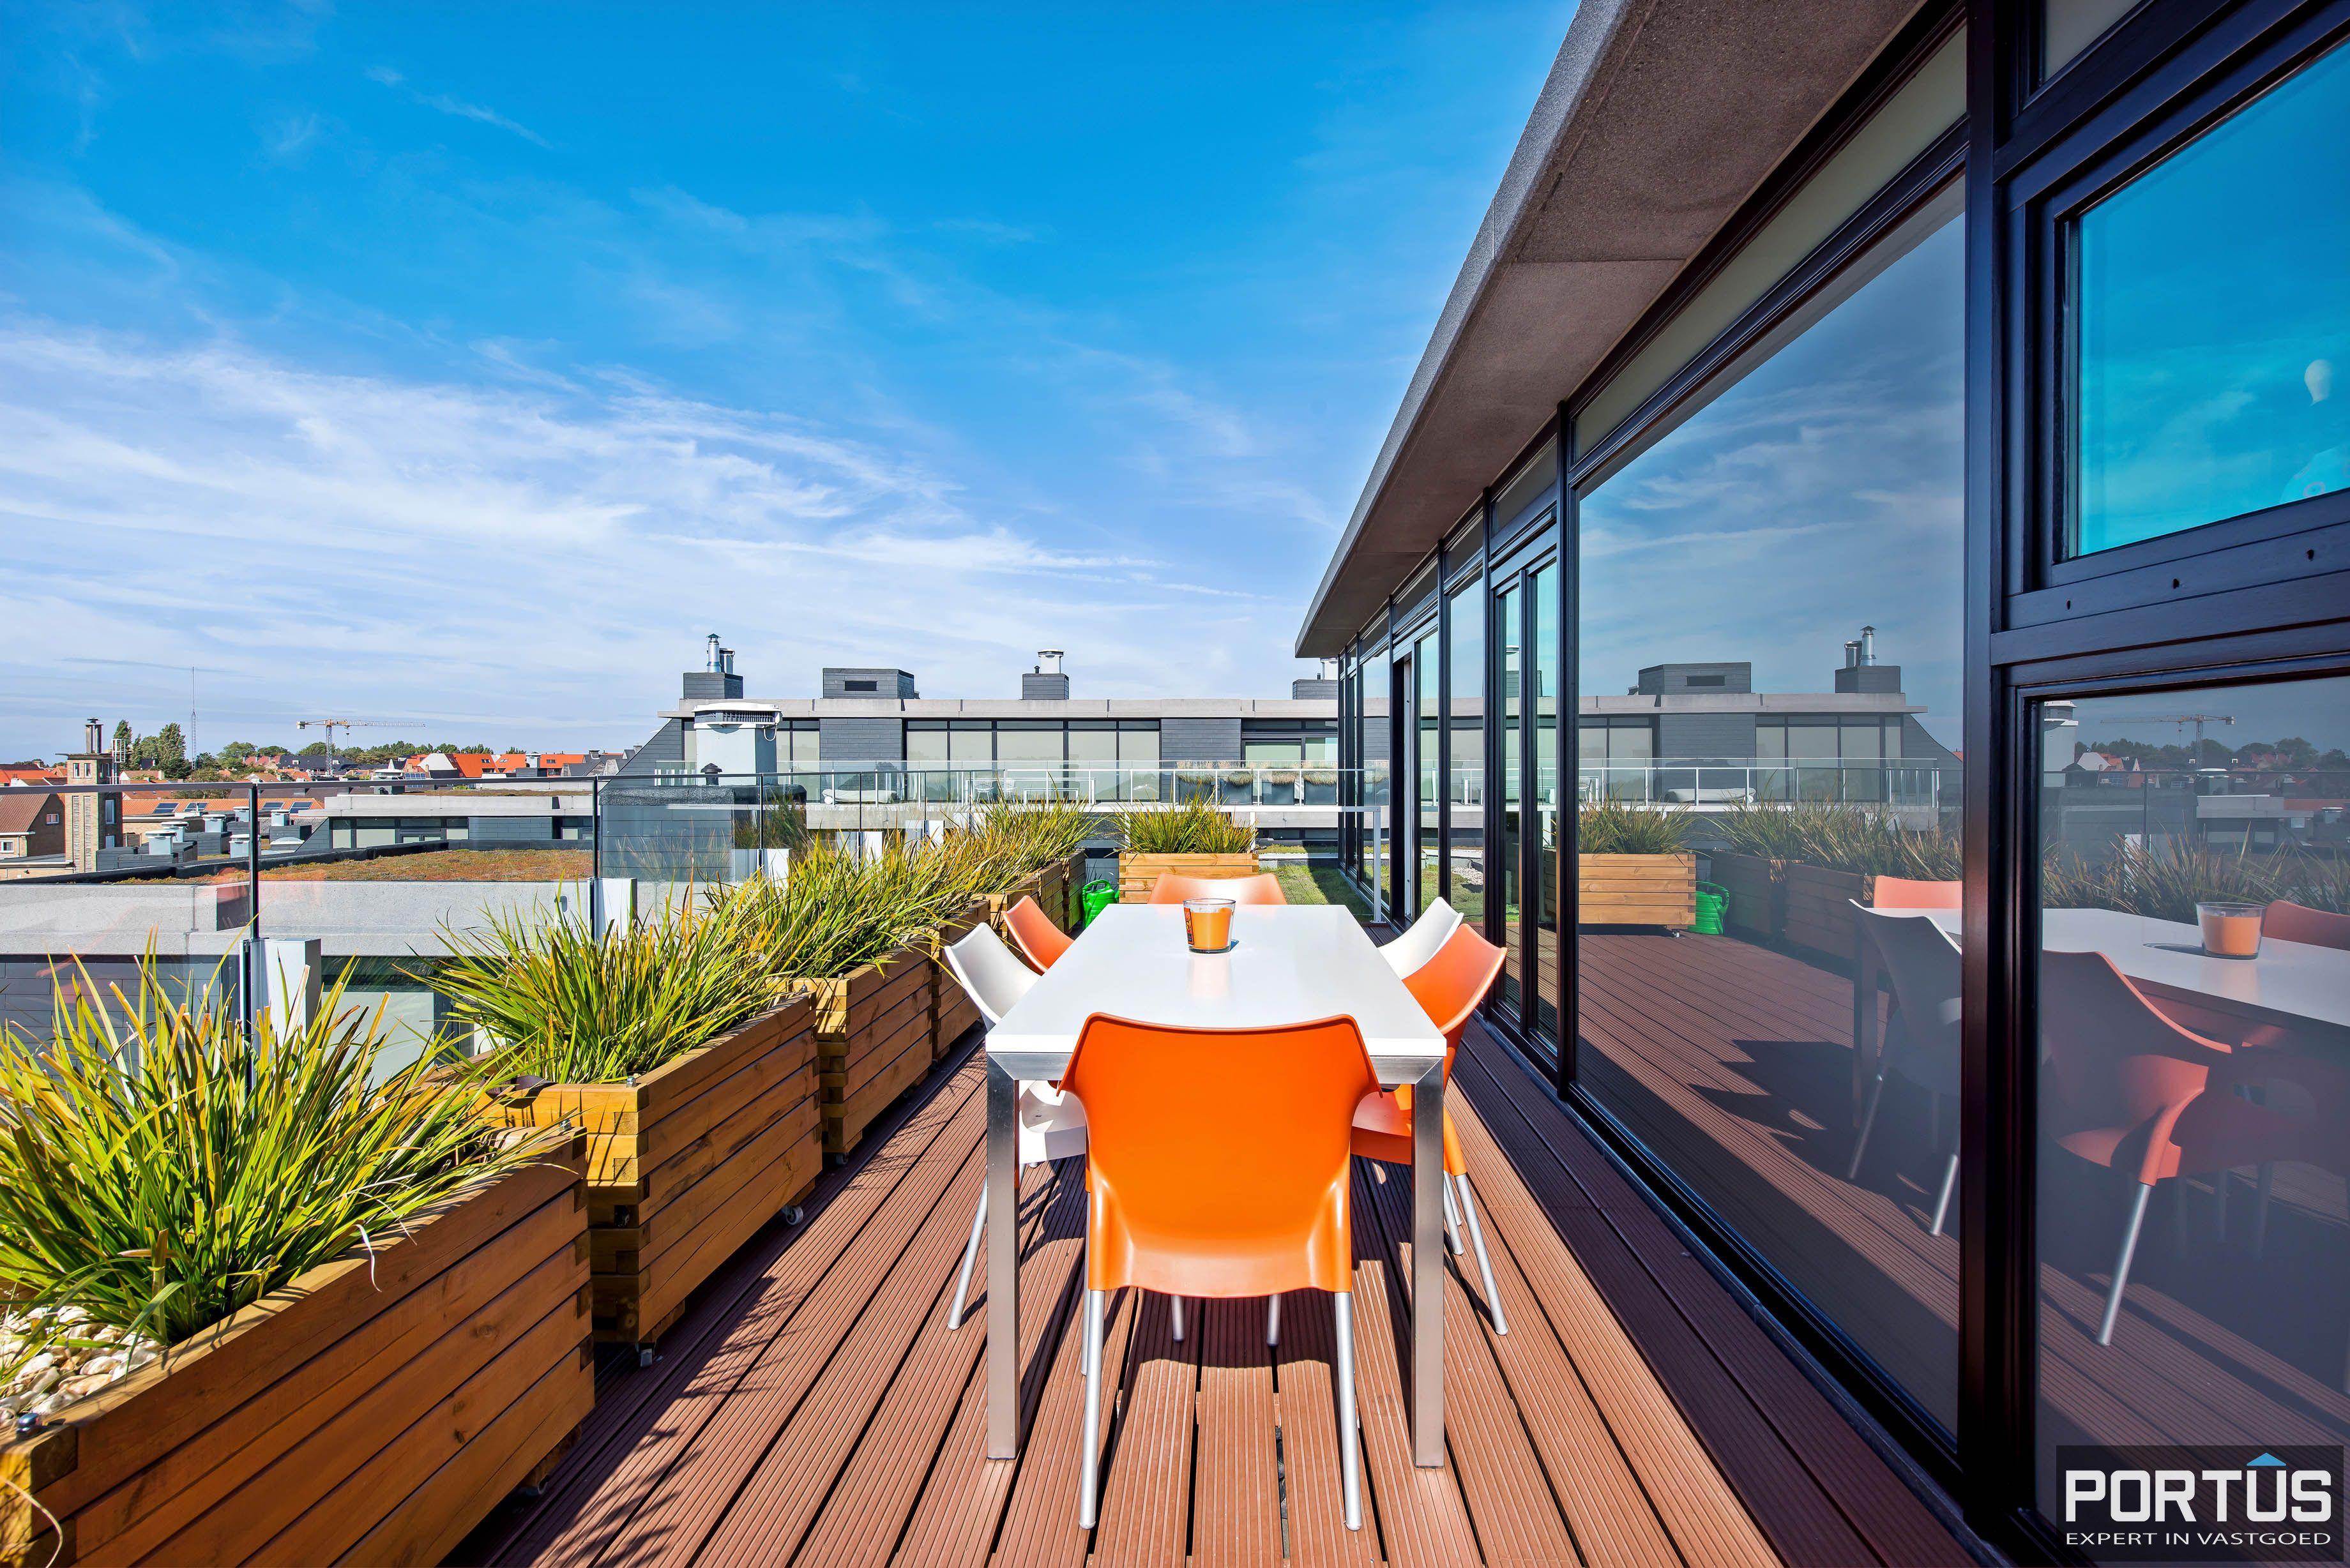 Exclusieve penthouse met 3 slaapkamers te koop te Nieuwpoort - 10931